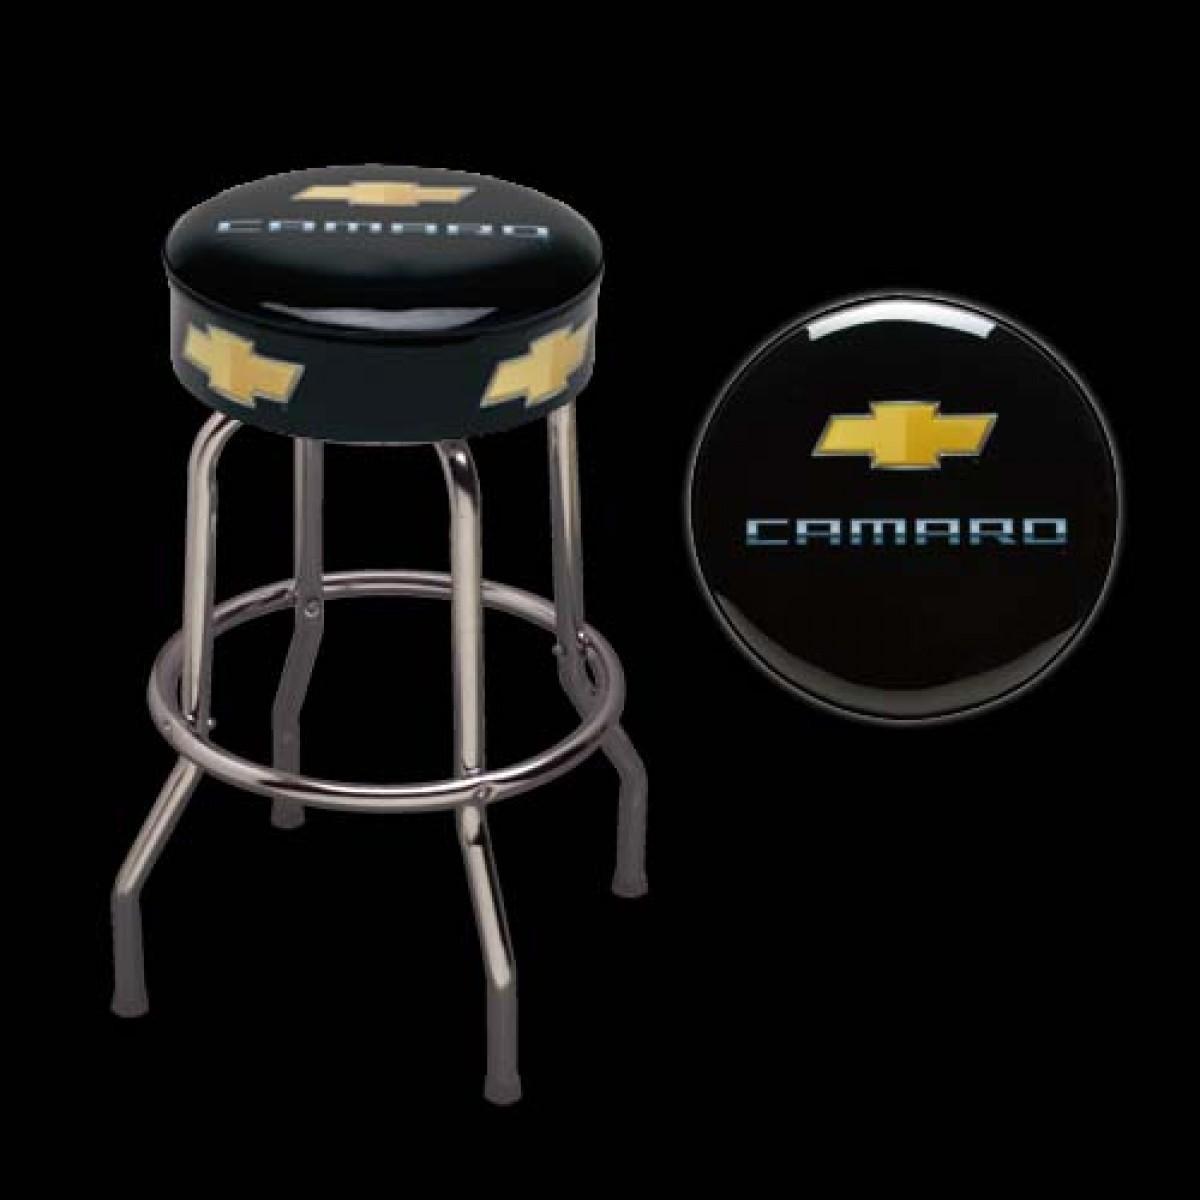 HossRodscom Chevy Camaro Counter Stool Hot Rod  : rw wb702 from www.hossrods.com size 1200 x 1200 jpeg 91kB